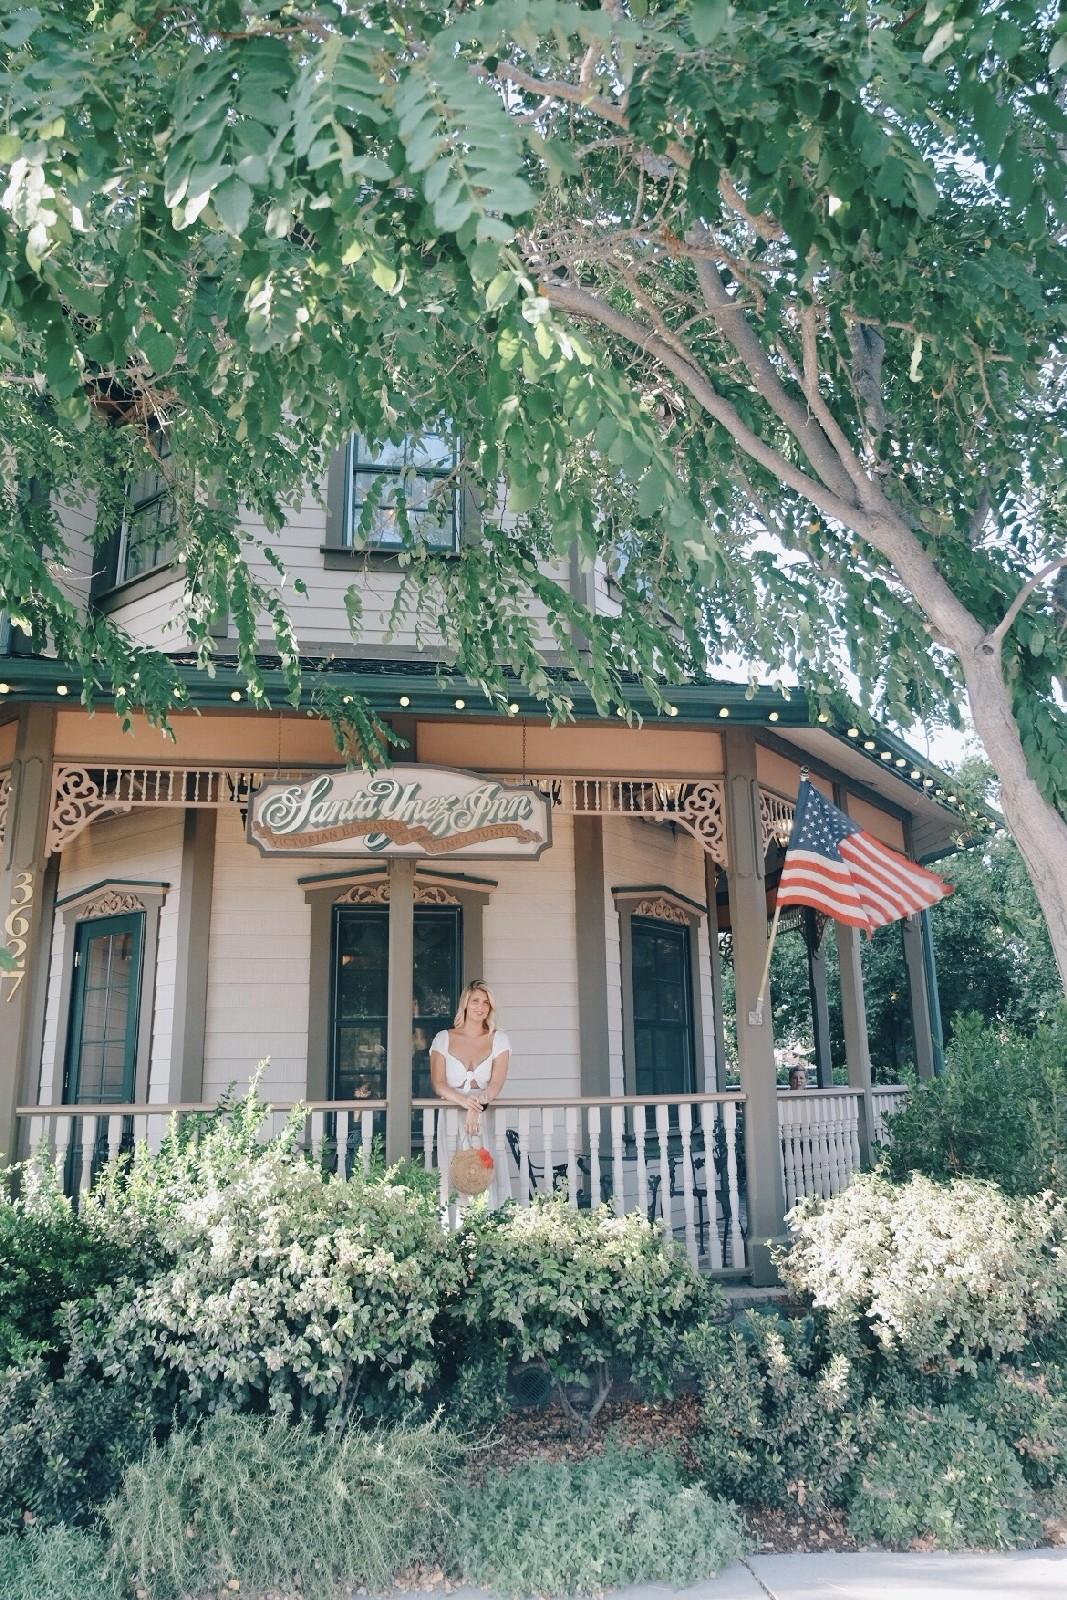 Highway 1 Road Trip - Santa Ynez Inn Front Porch